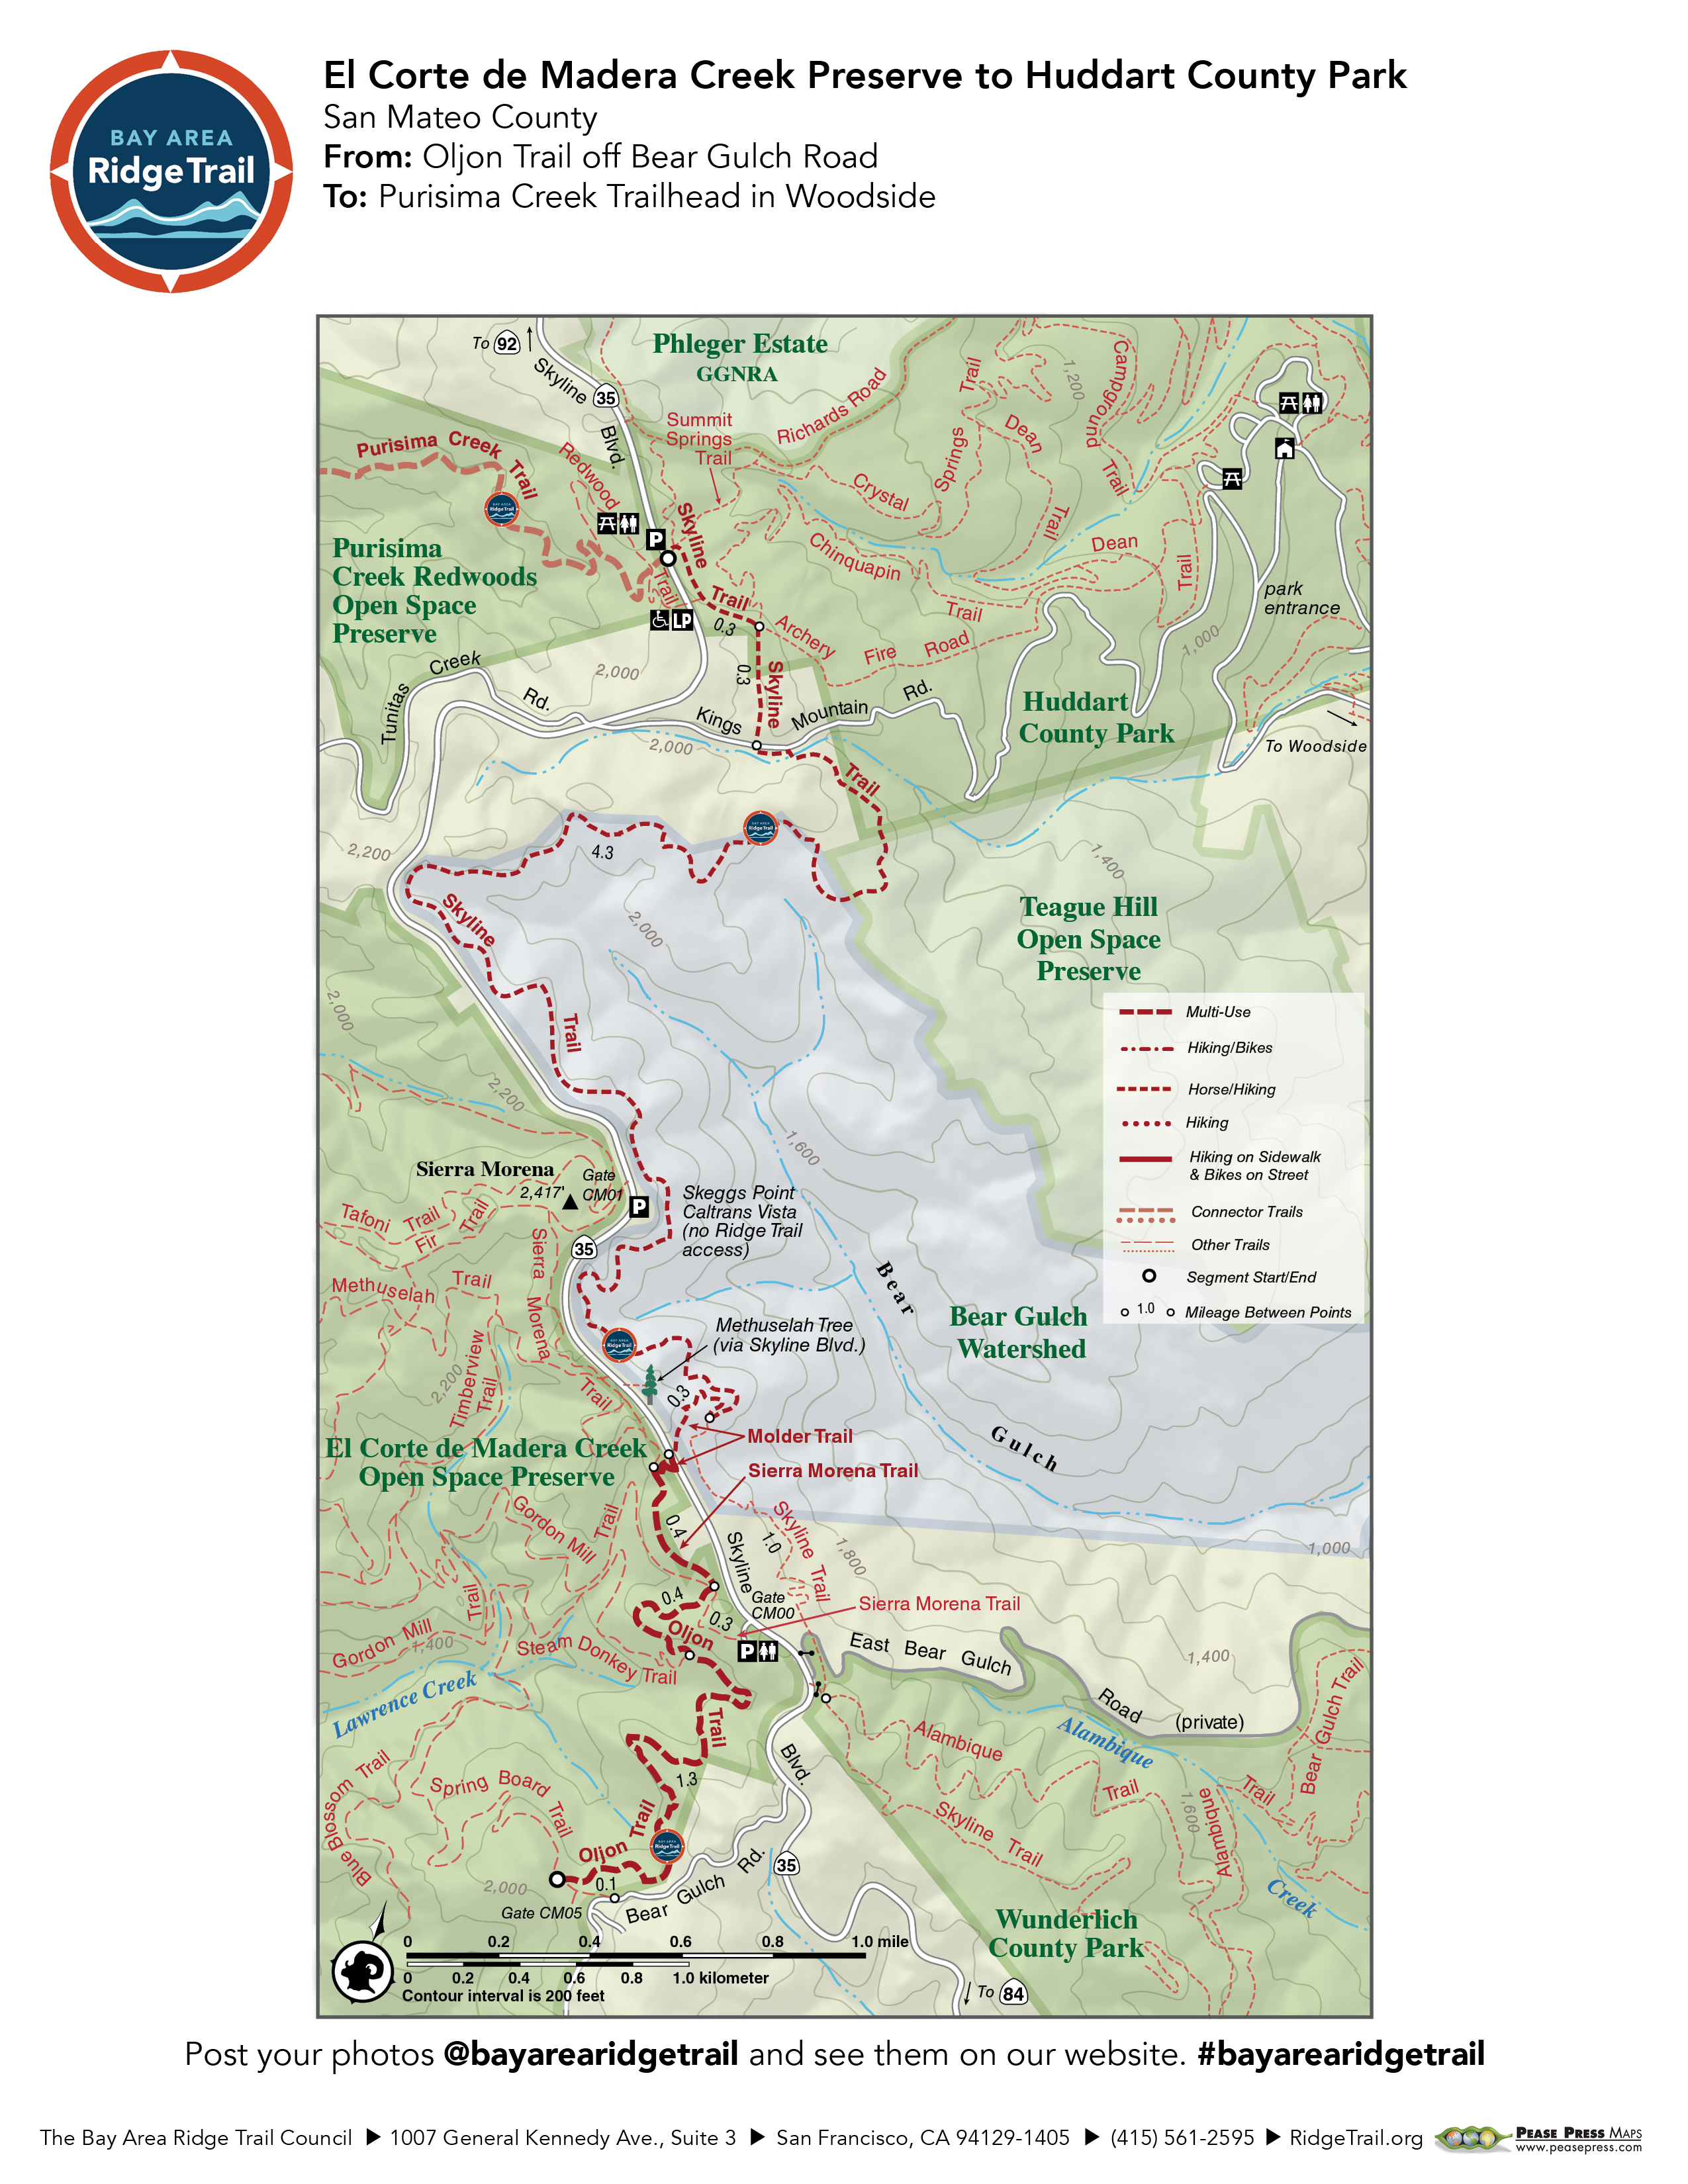 El Corte de Madera Creek Preserve to Huddart County Park